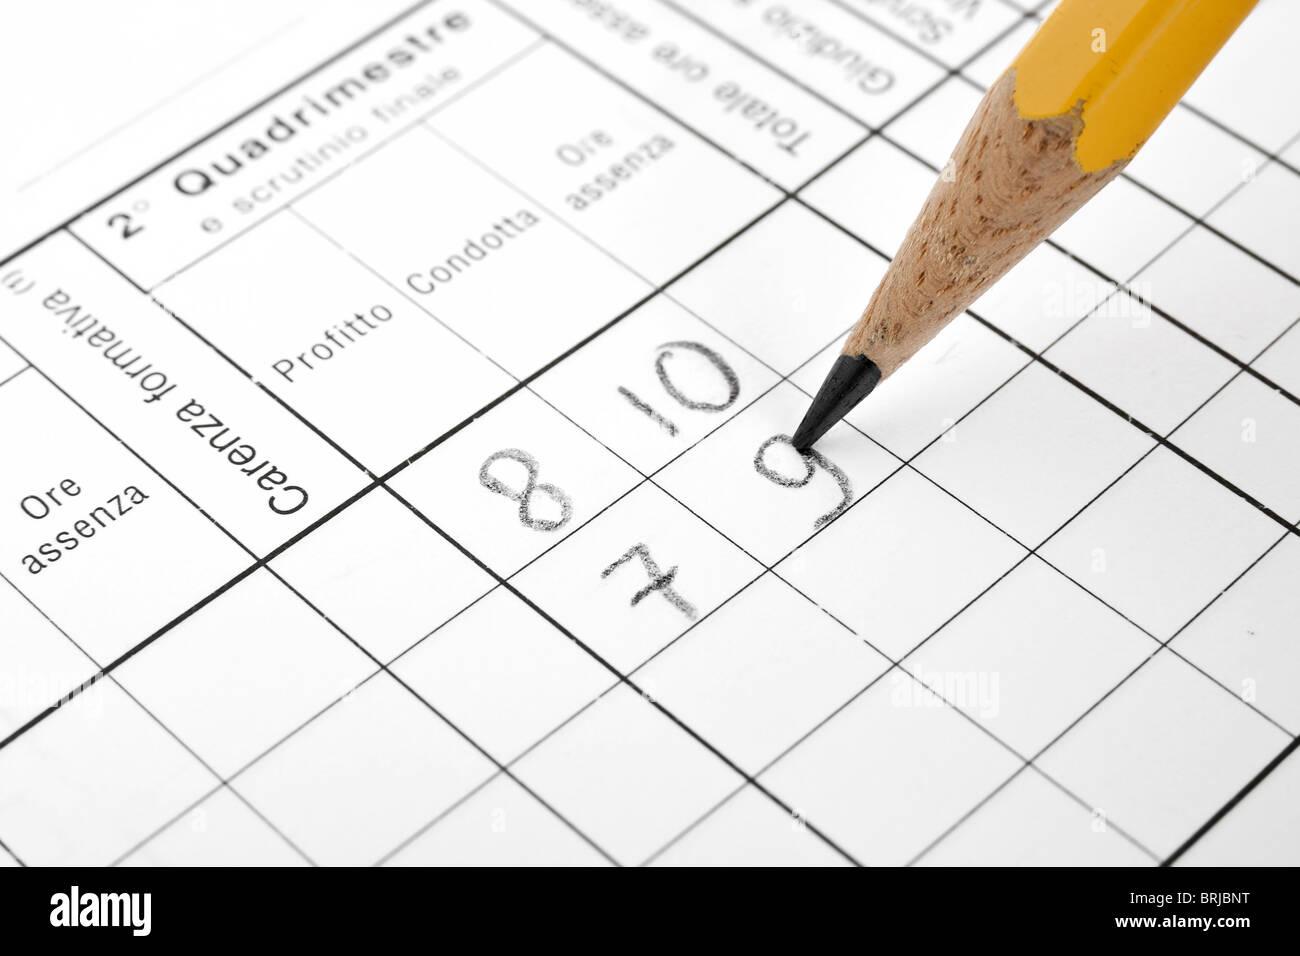 closeup of italian school report card with pencil - Stock Image